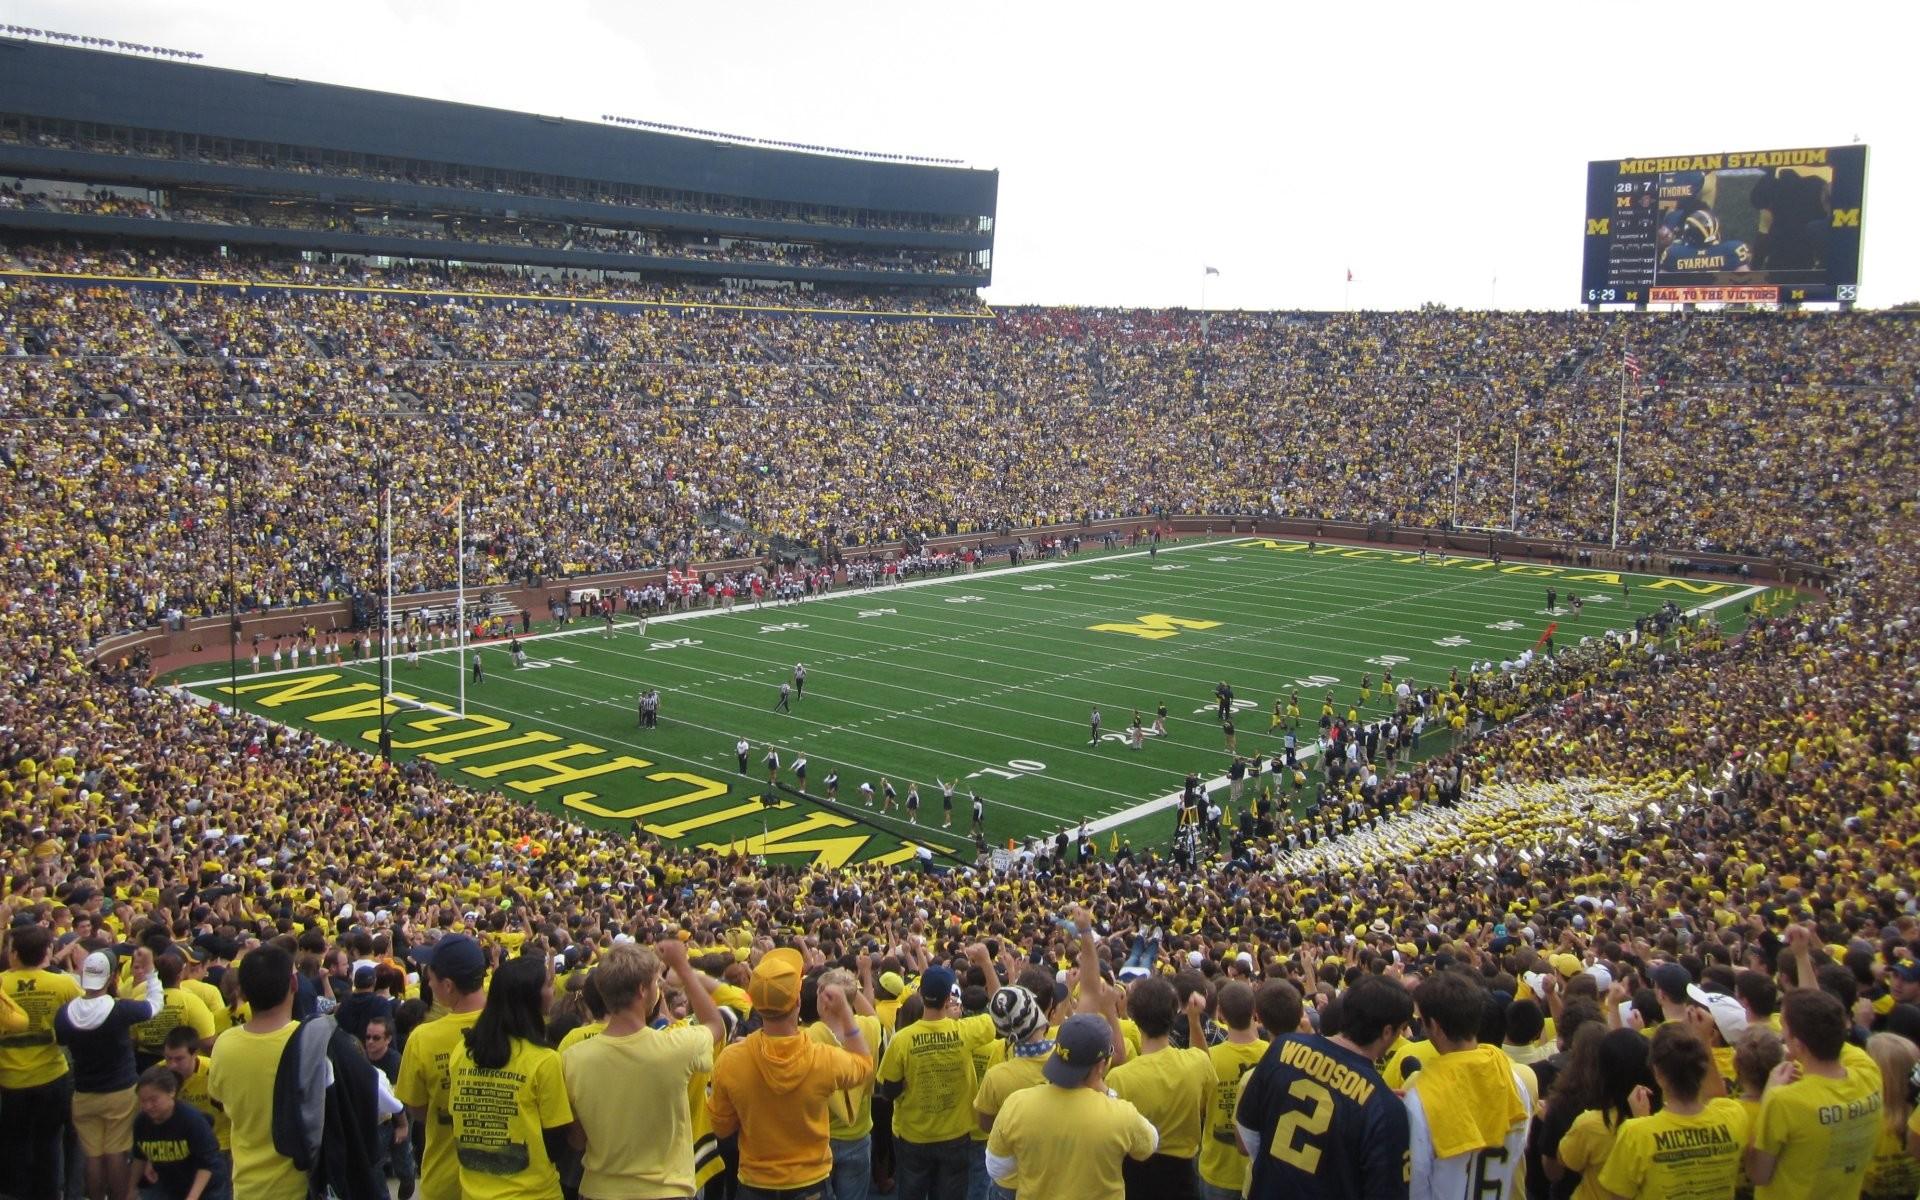 Michigan State University Wallpapers: Michigan State Football Wallpaper HD (73+ Images